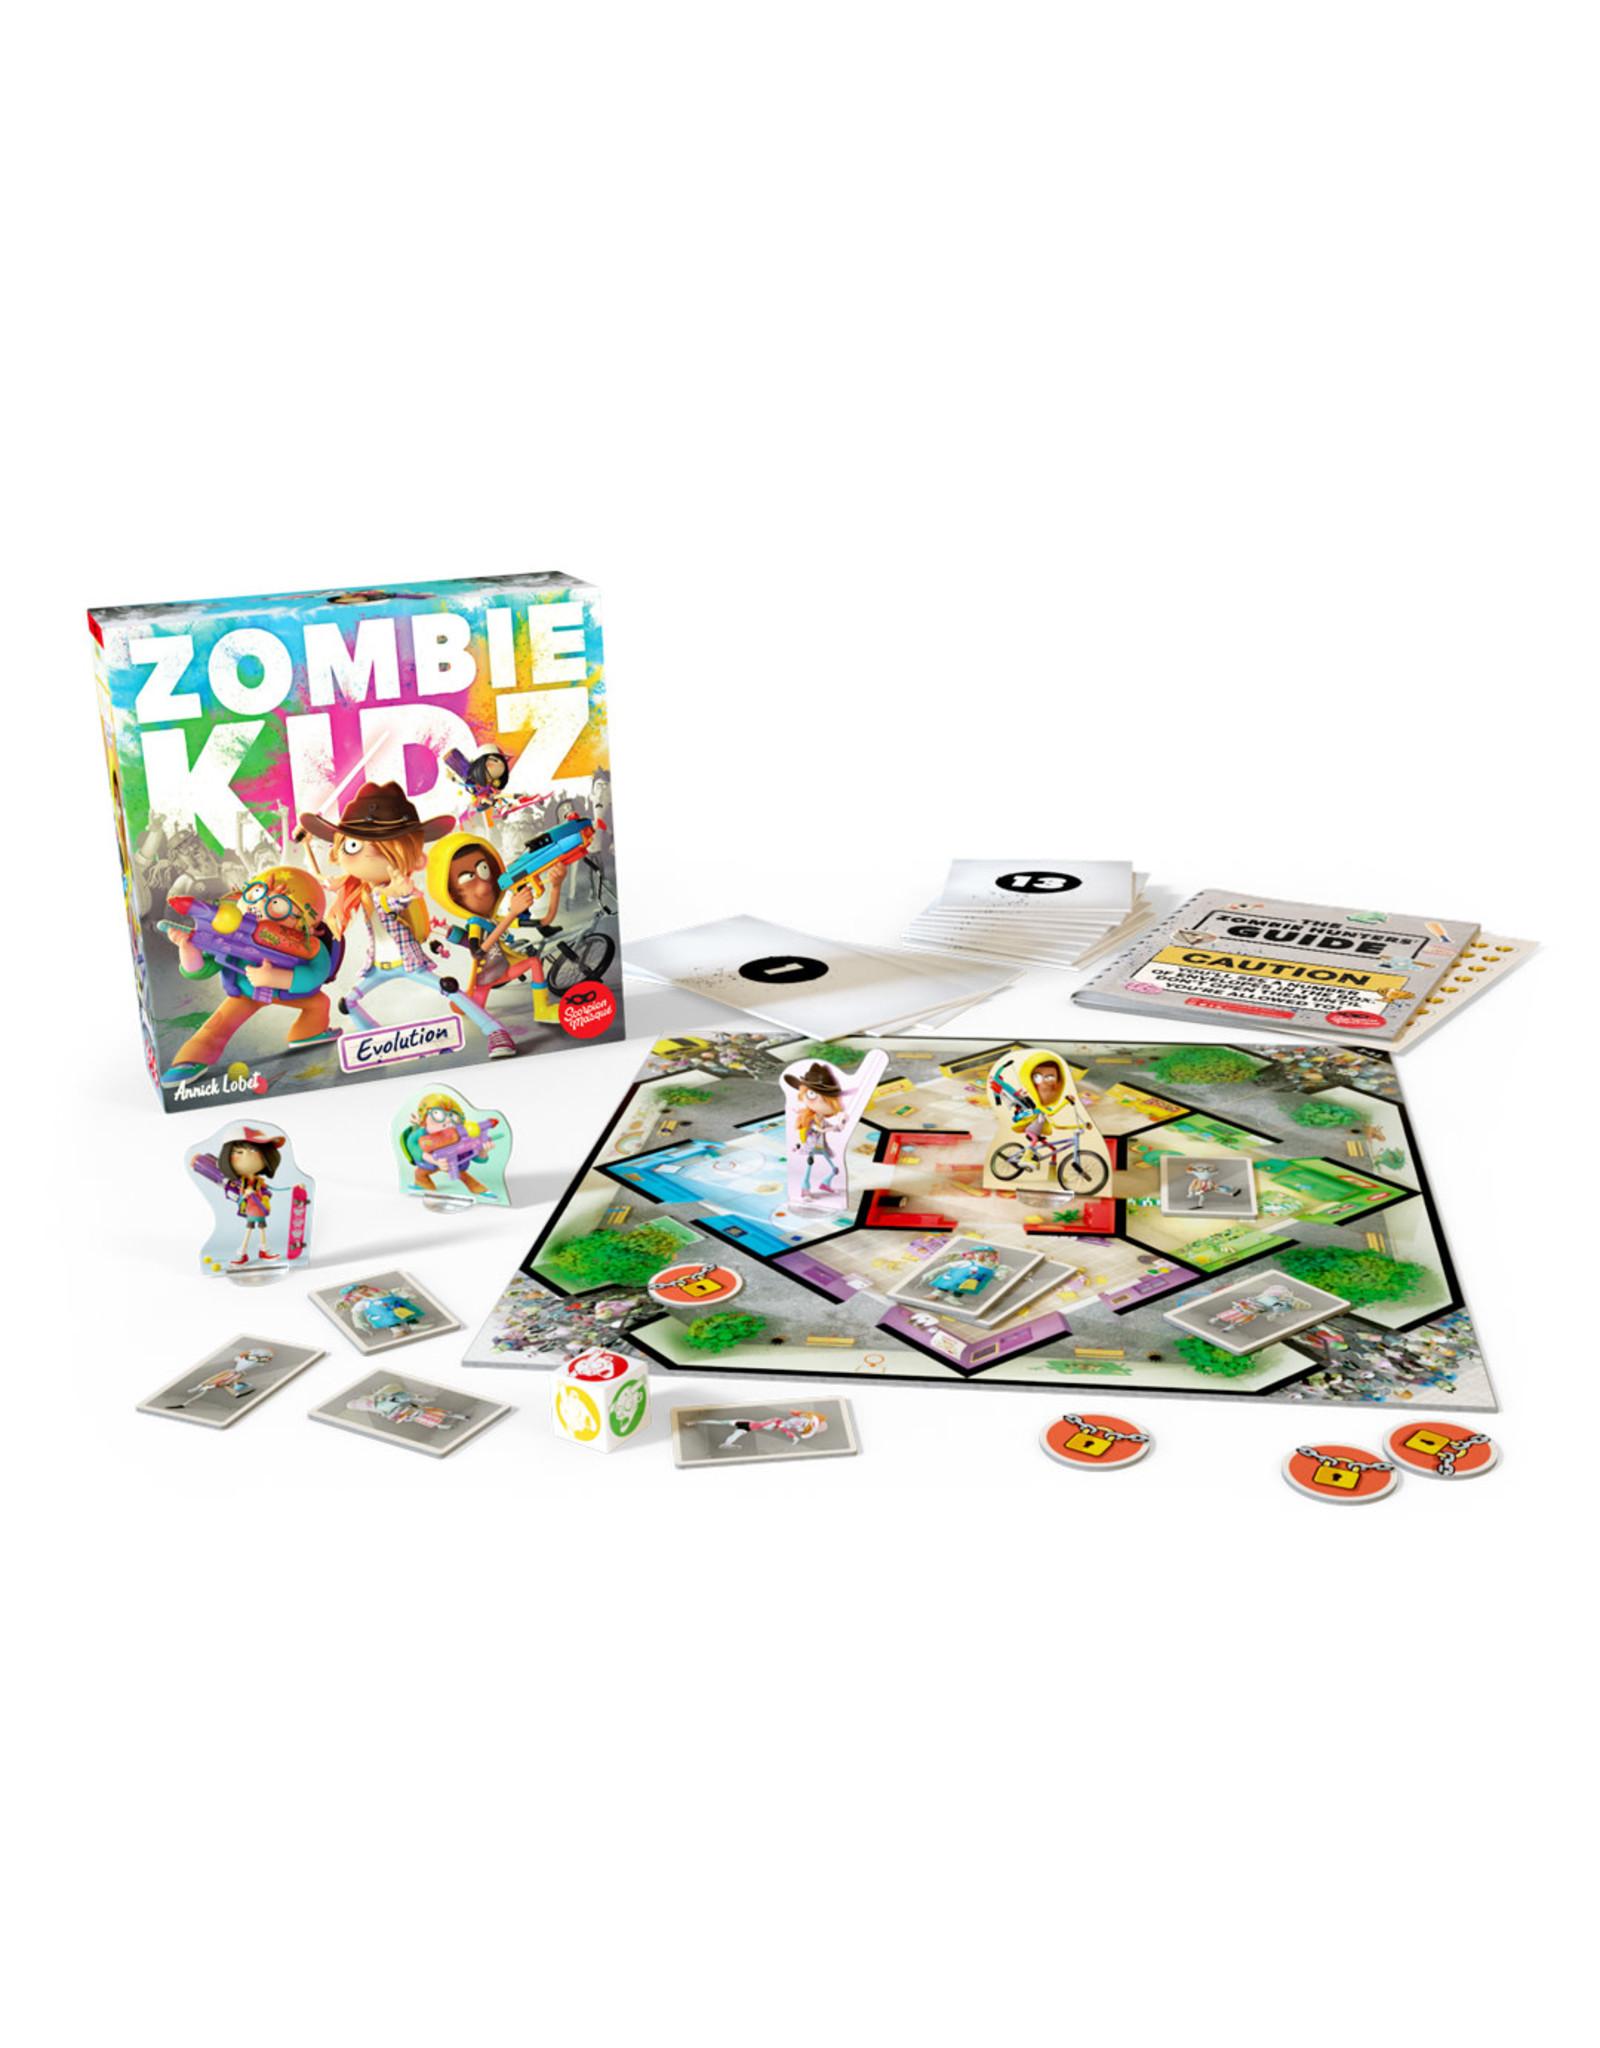 Scorpion Masque Zombie Kidz Evolution Game